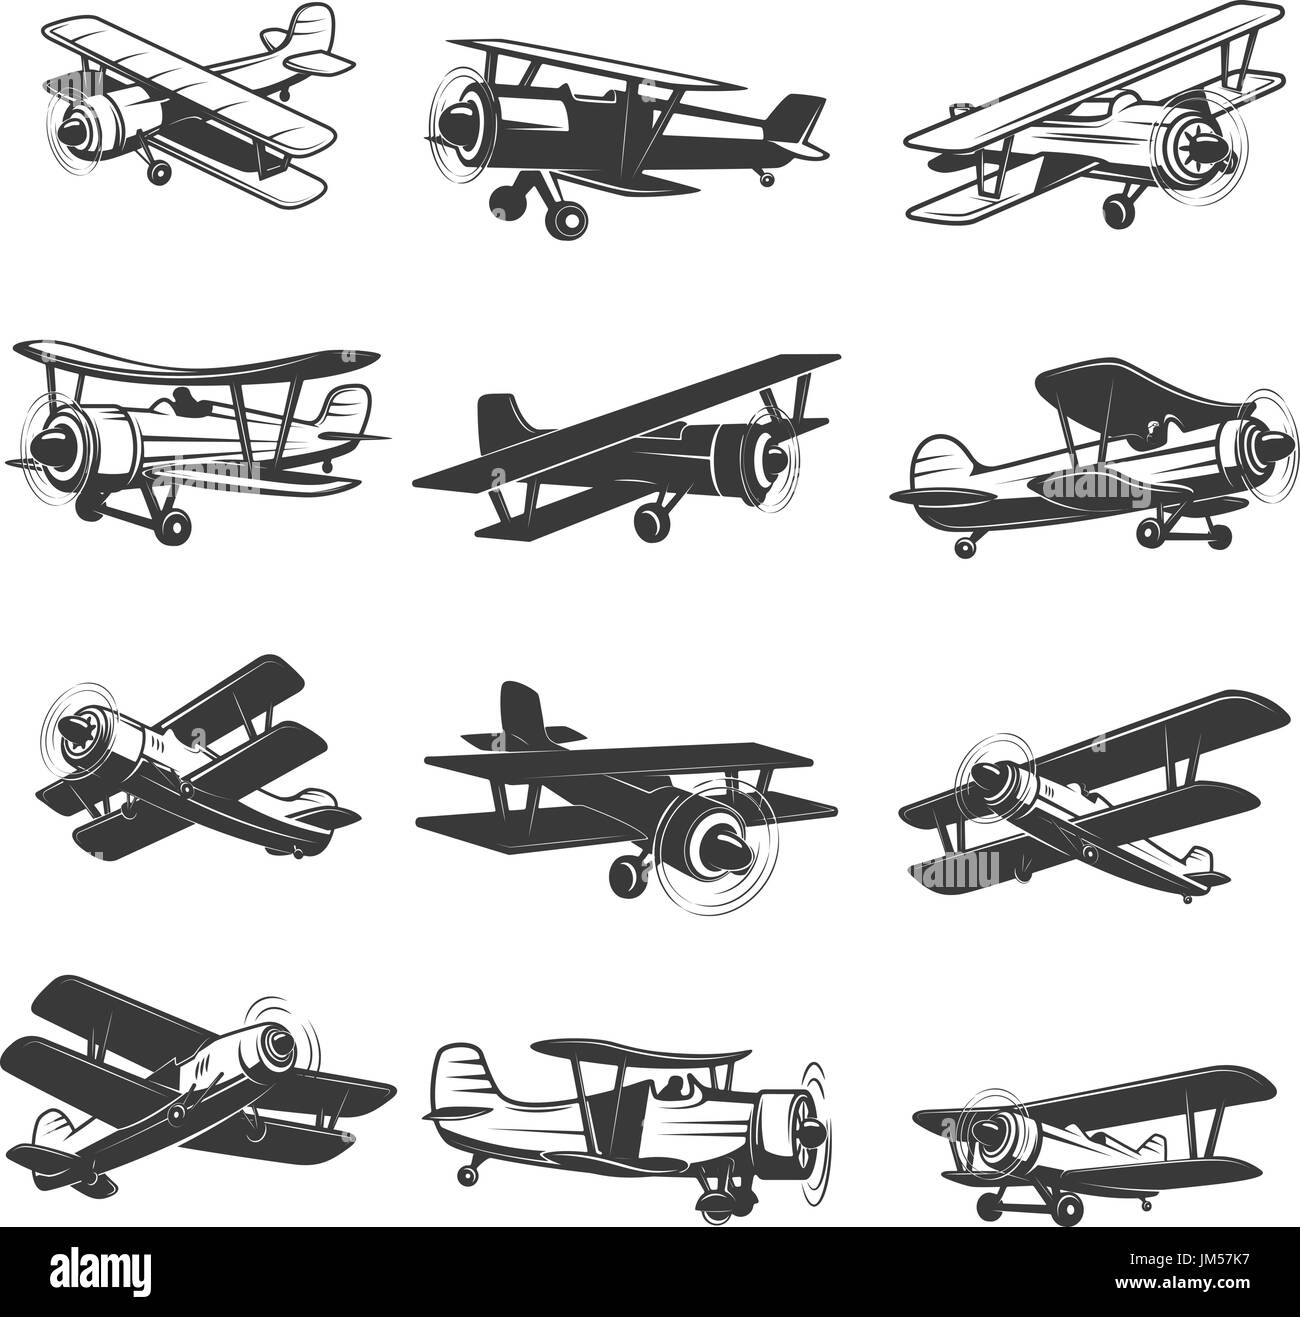 set of vintage airplanes icons. Aircraft illustrations. Design element for logo, label, emblem, sign. Vector illustration. - Stock Image